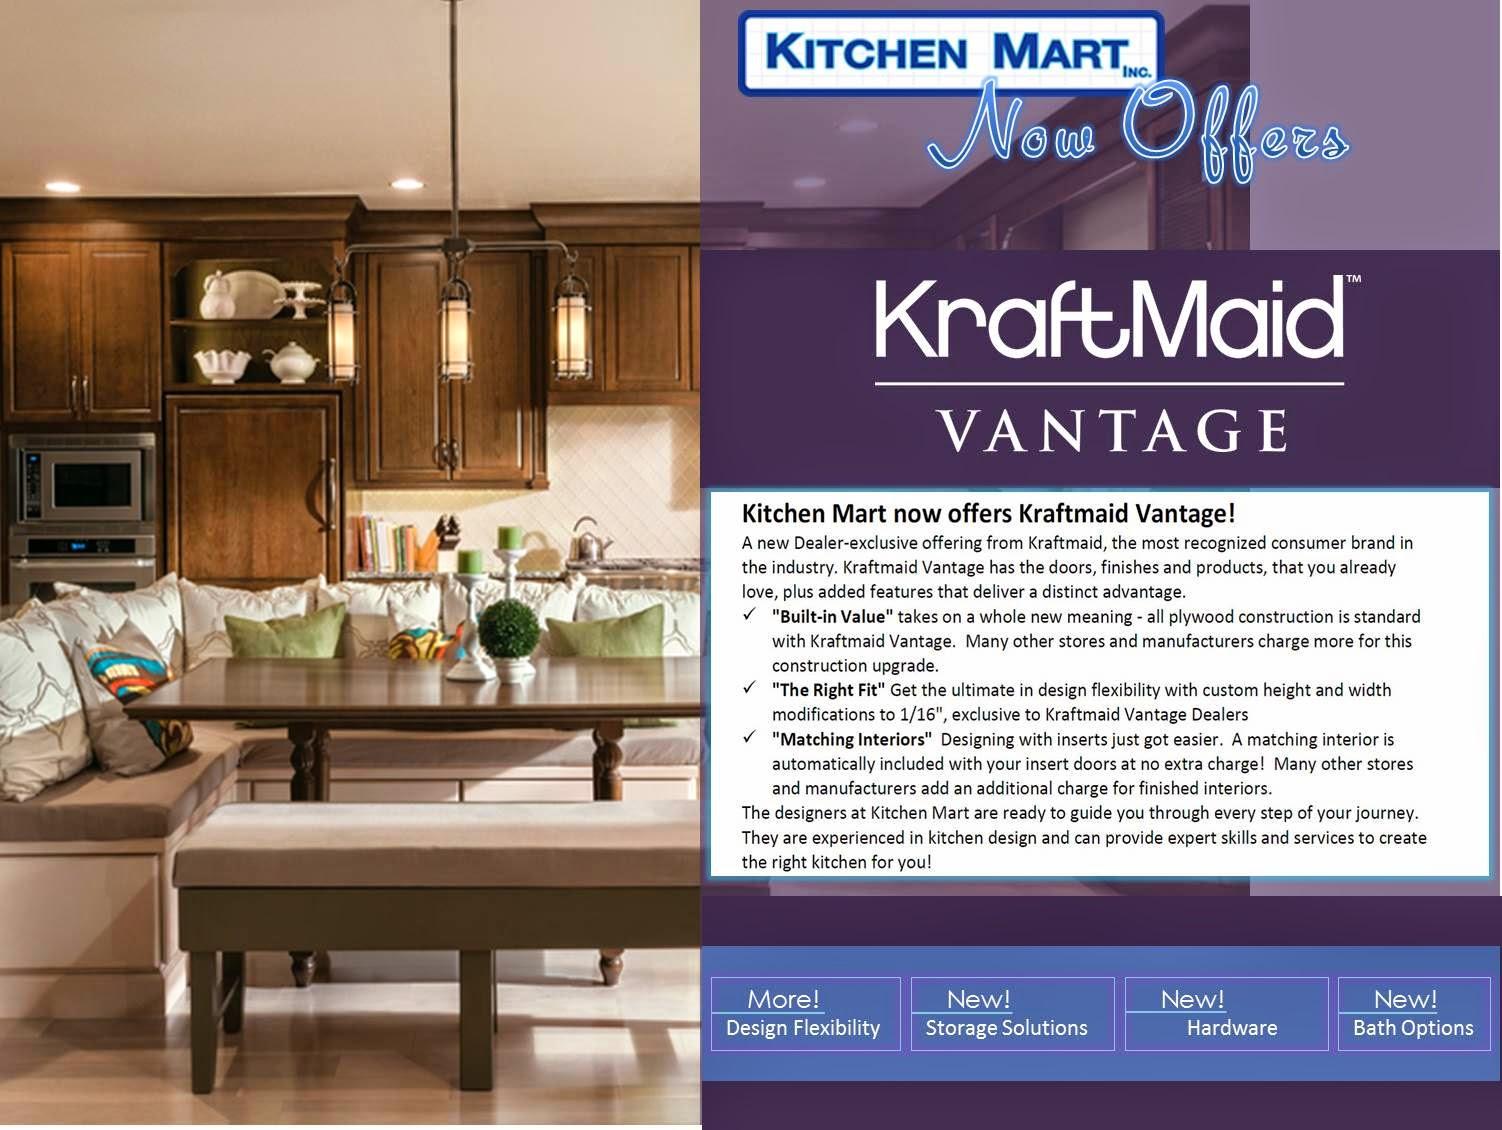 Kitchen Mart Now Offers Kraftmaid Vantage